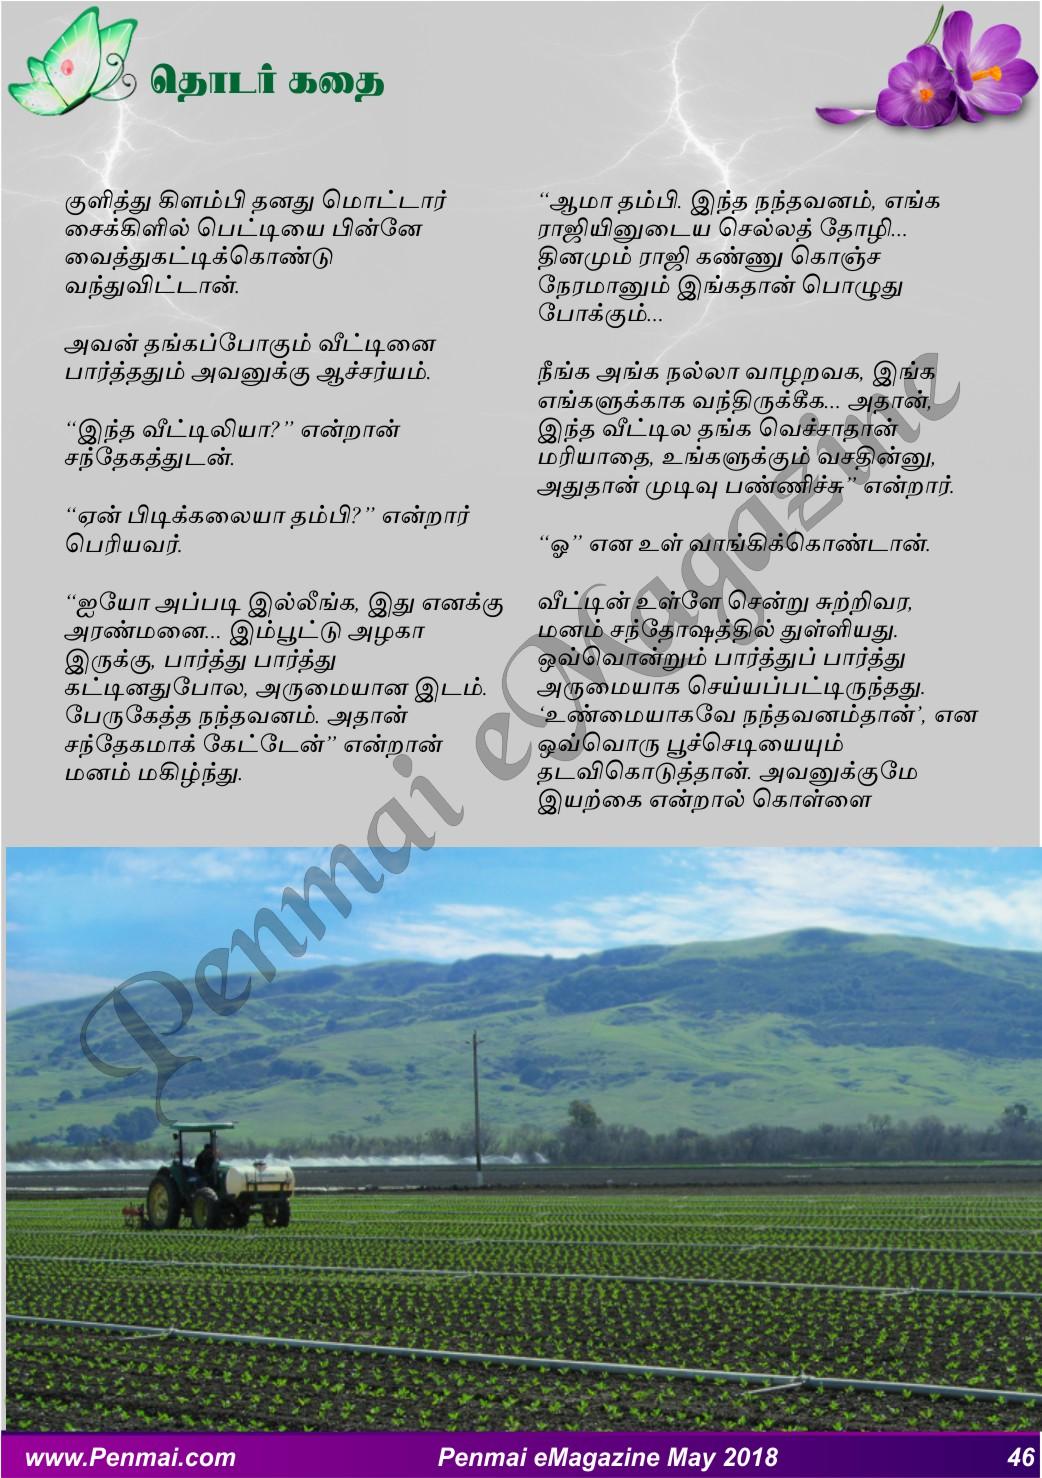 Penmai-eMagazine-May-2018-46.jpg